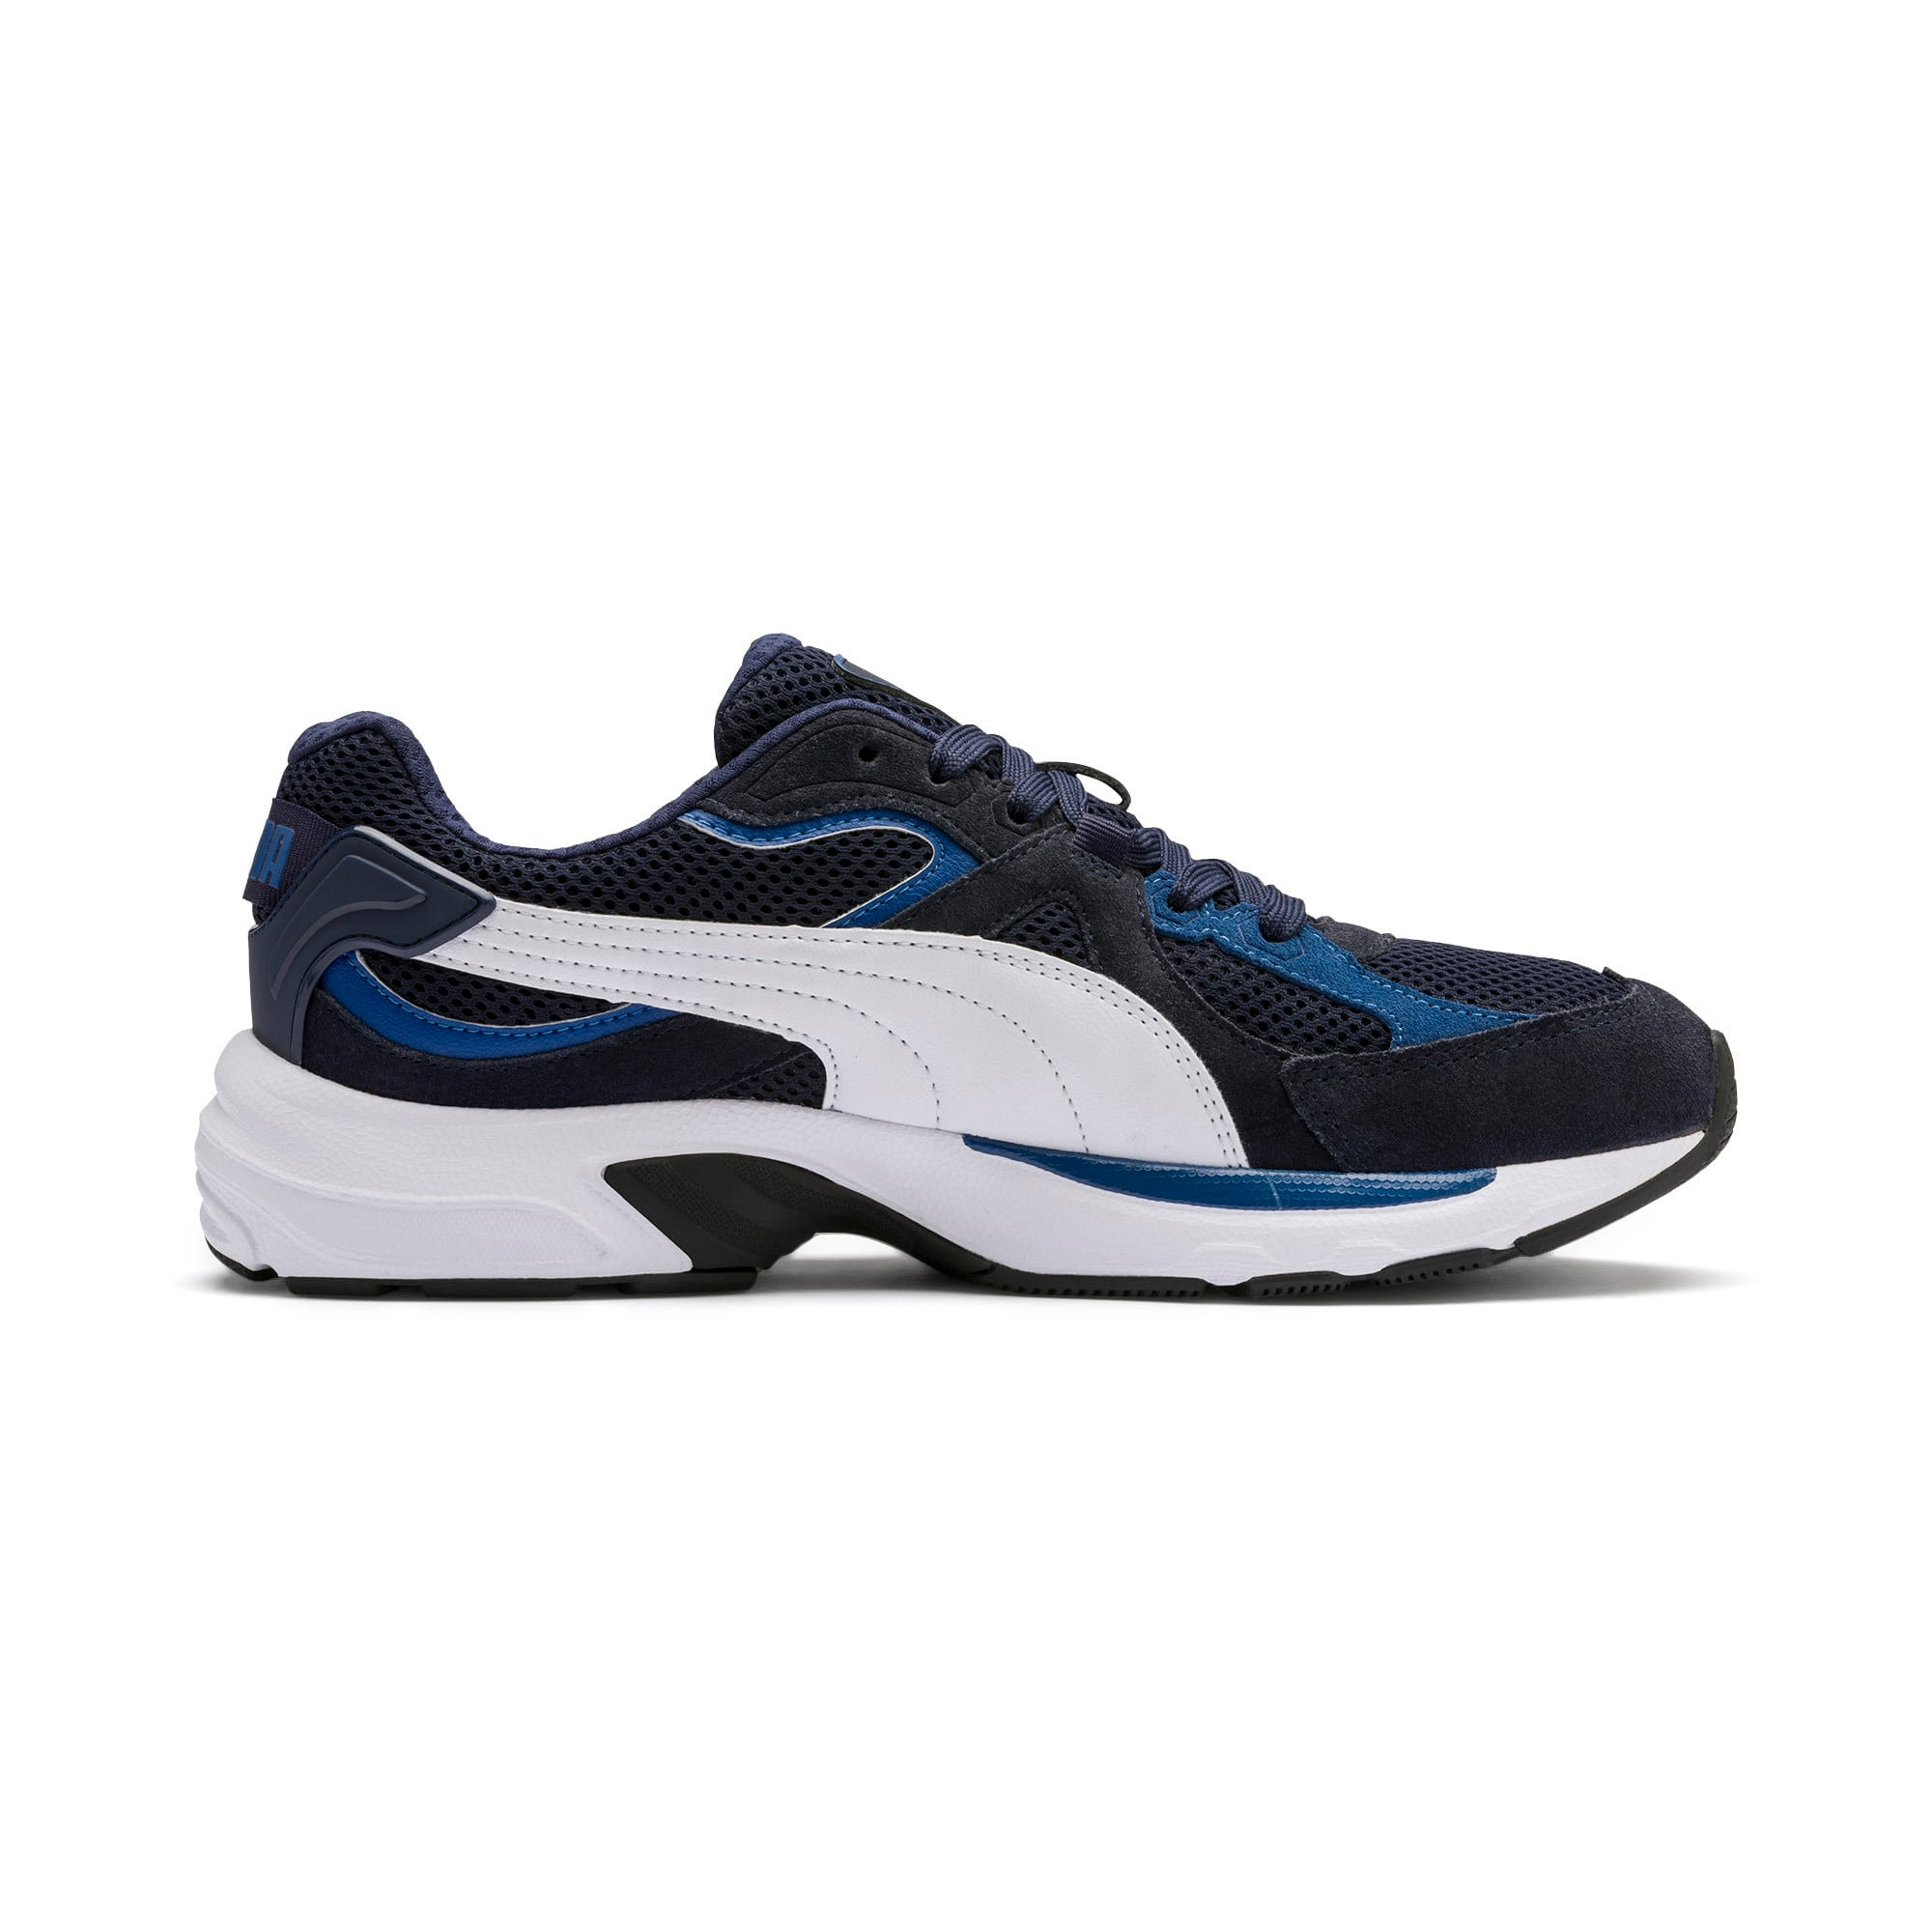 Miniatura 6 de Zapatos deportivos Axis Plus Suede, Peacoat-G Blue-White-Black, mediano